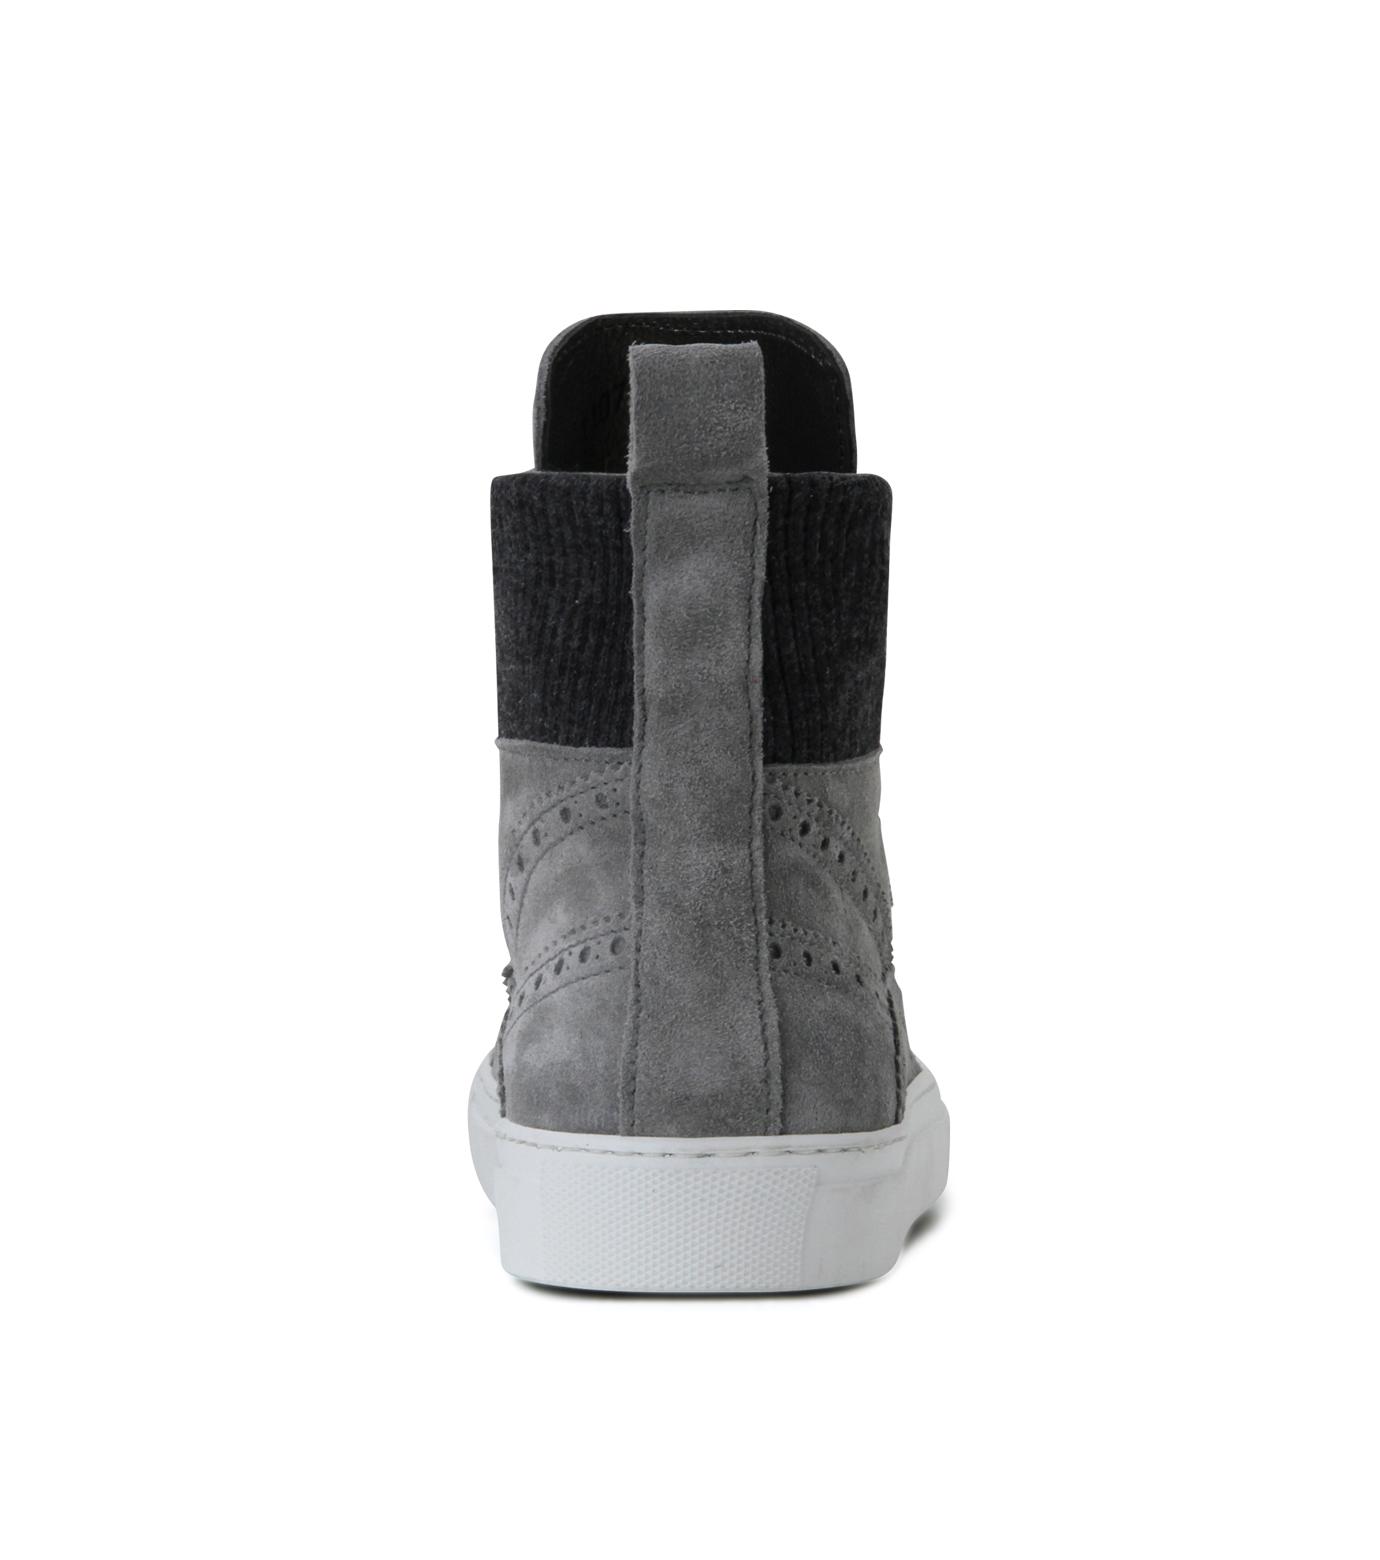 Les Homme(レゾム)のKnit Sneaker-LIGHT GRAY-LH1212-1107 拡大詳細画像2